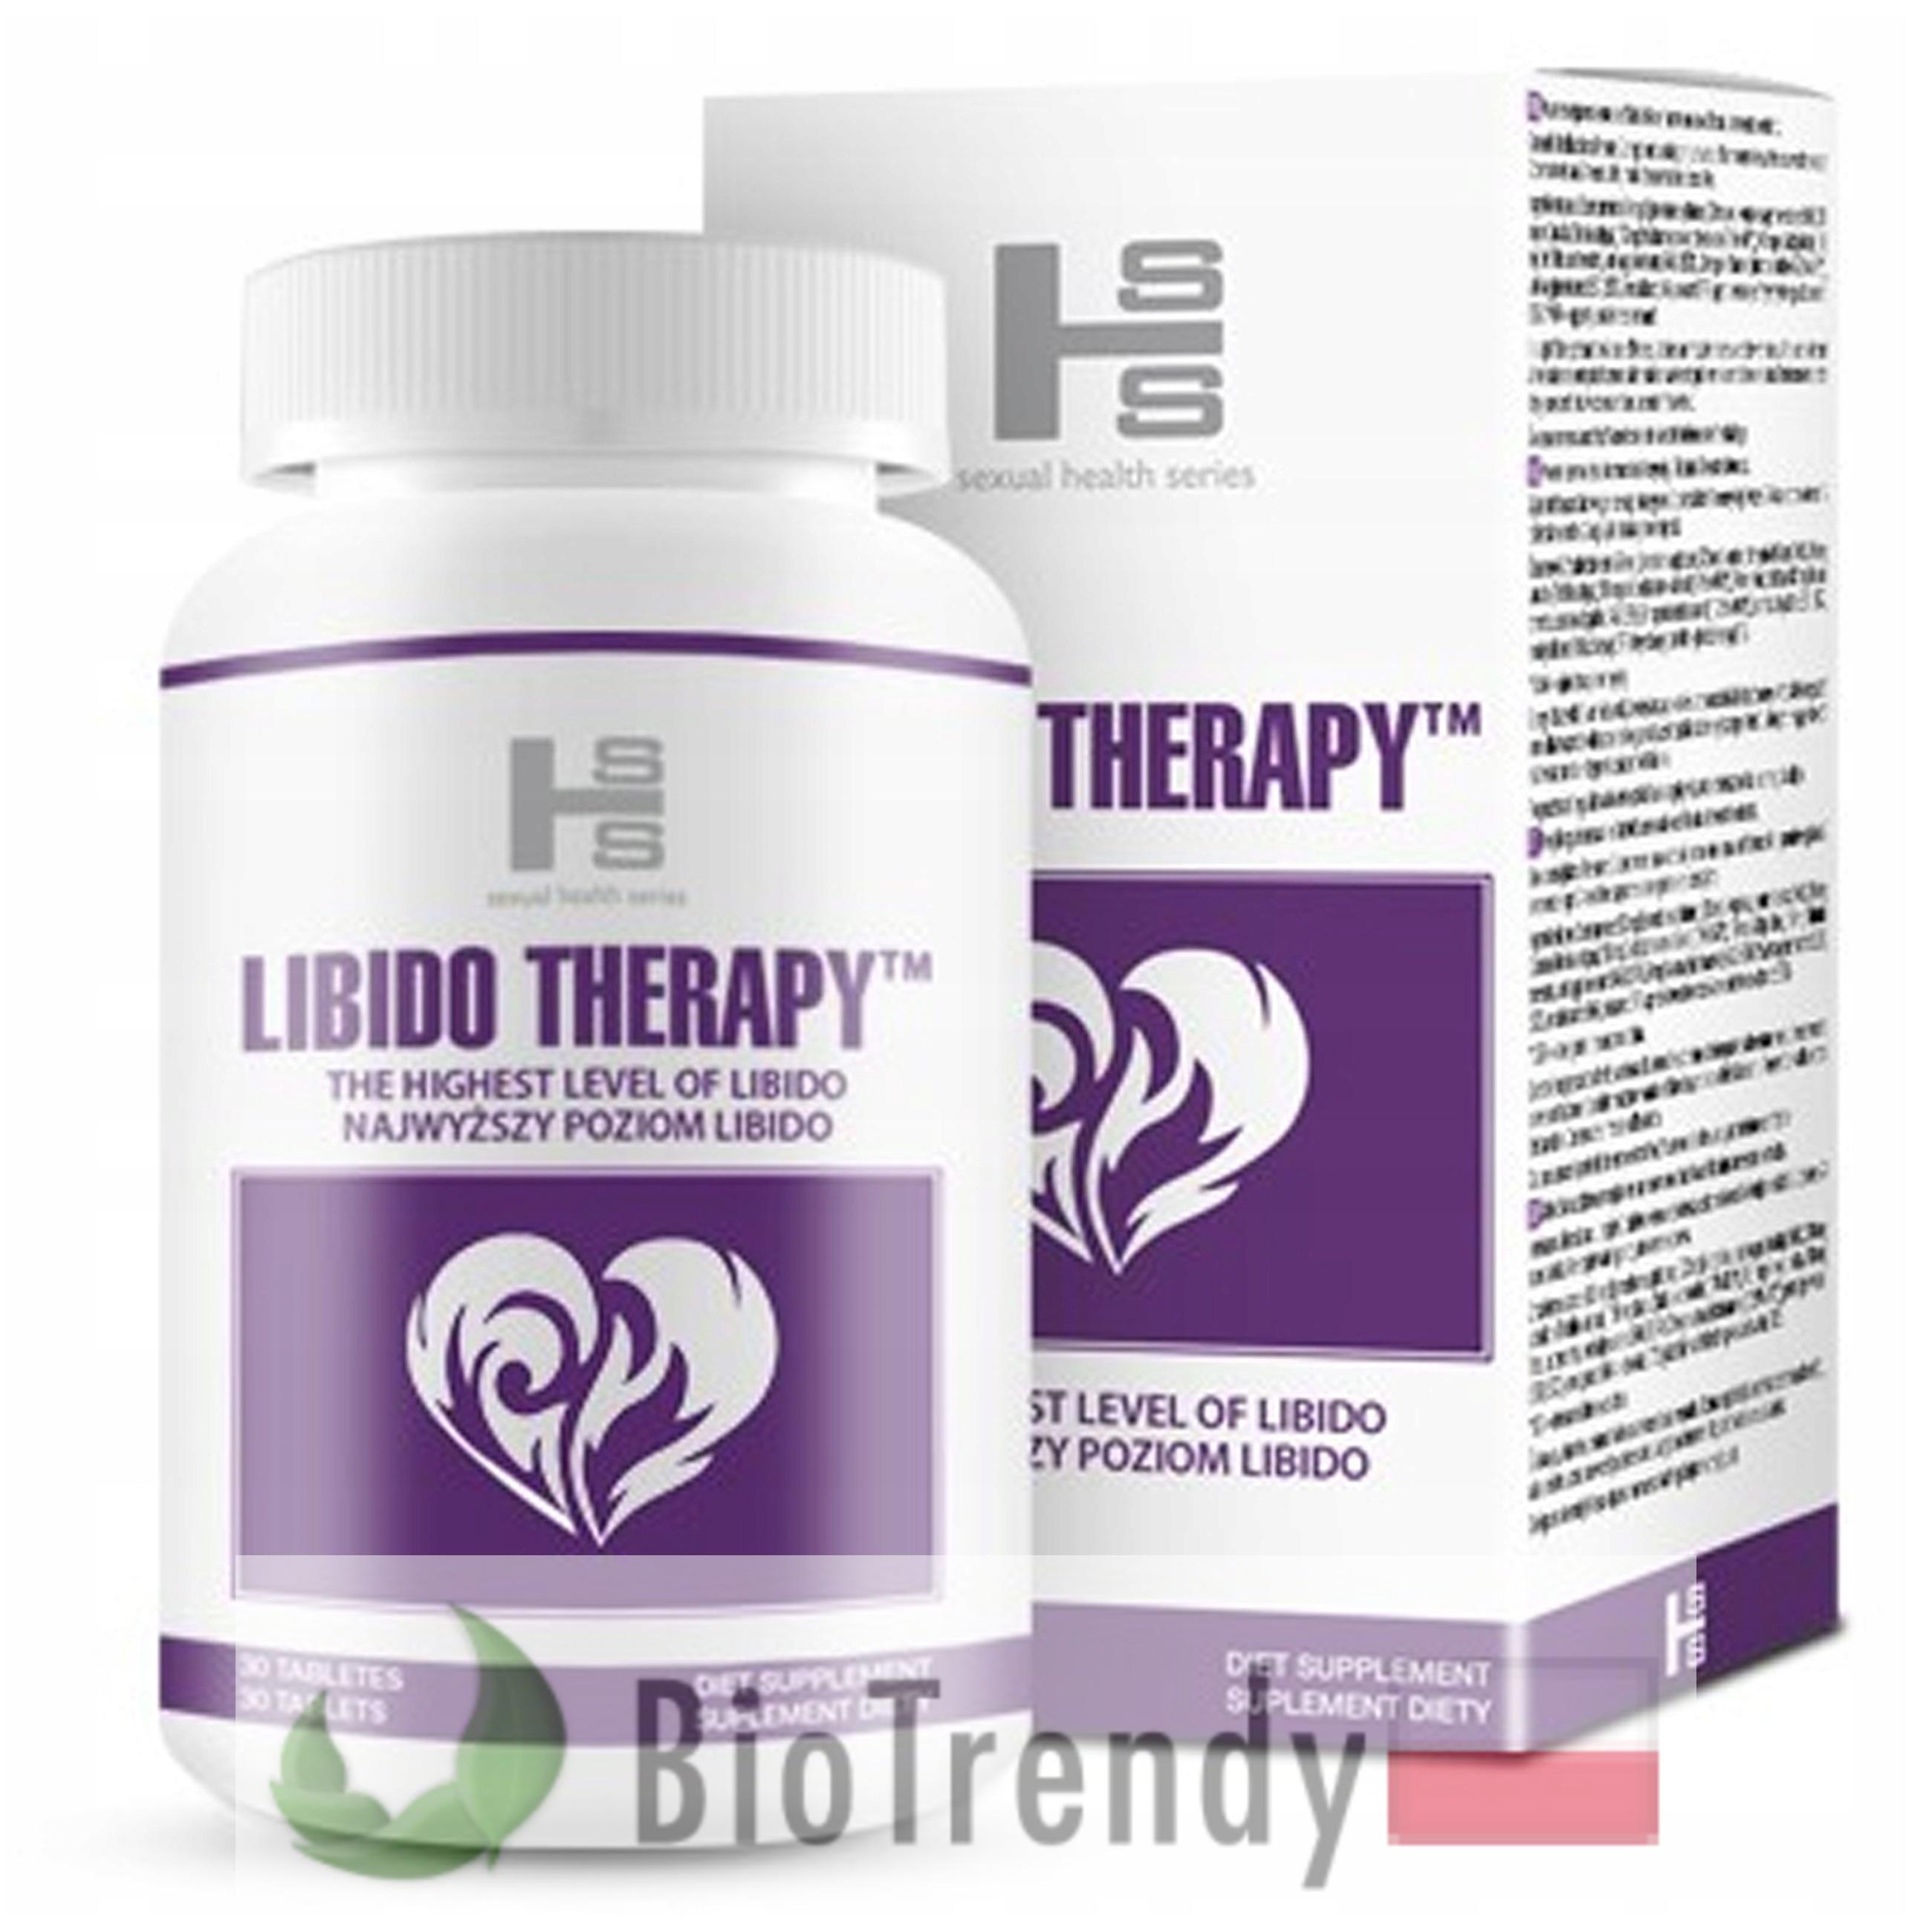 Viagra dla kobiet - libido u kobiet - obnizone libido - spadek libido - viagra dla pań - libido co to